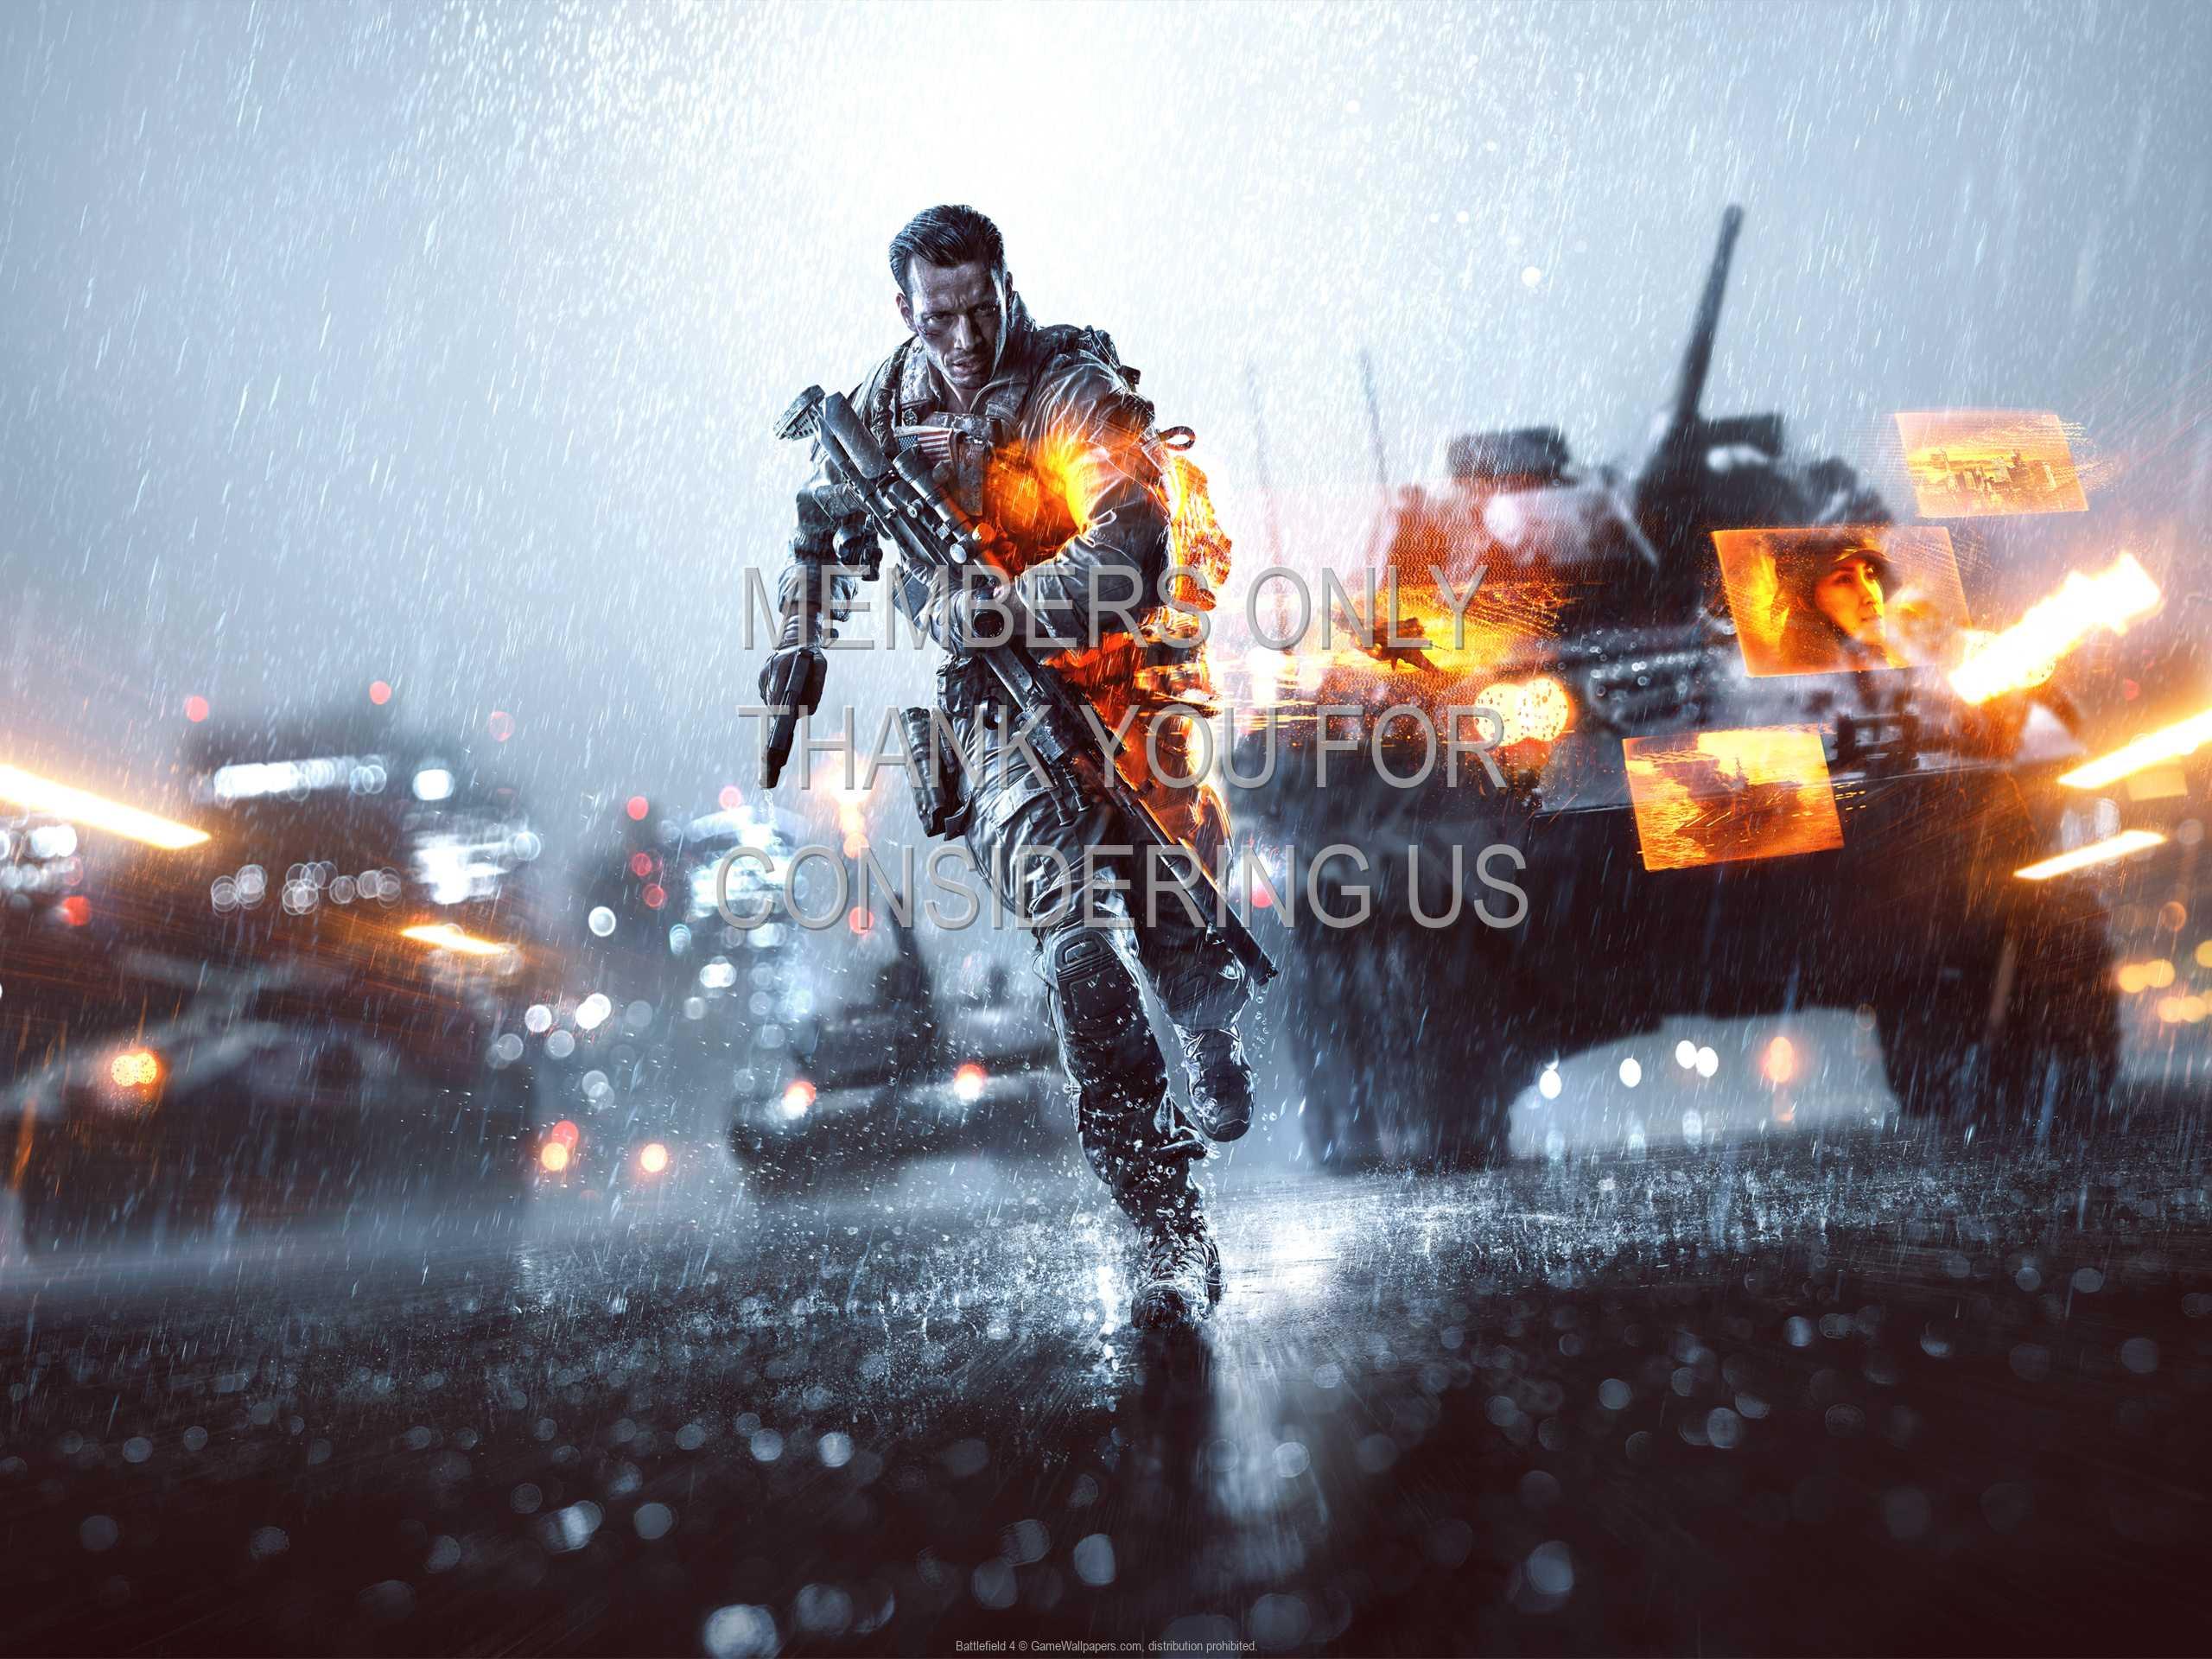 Battlefield 4 1080p Horizontal Mobile fond d'écran 01